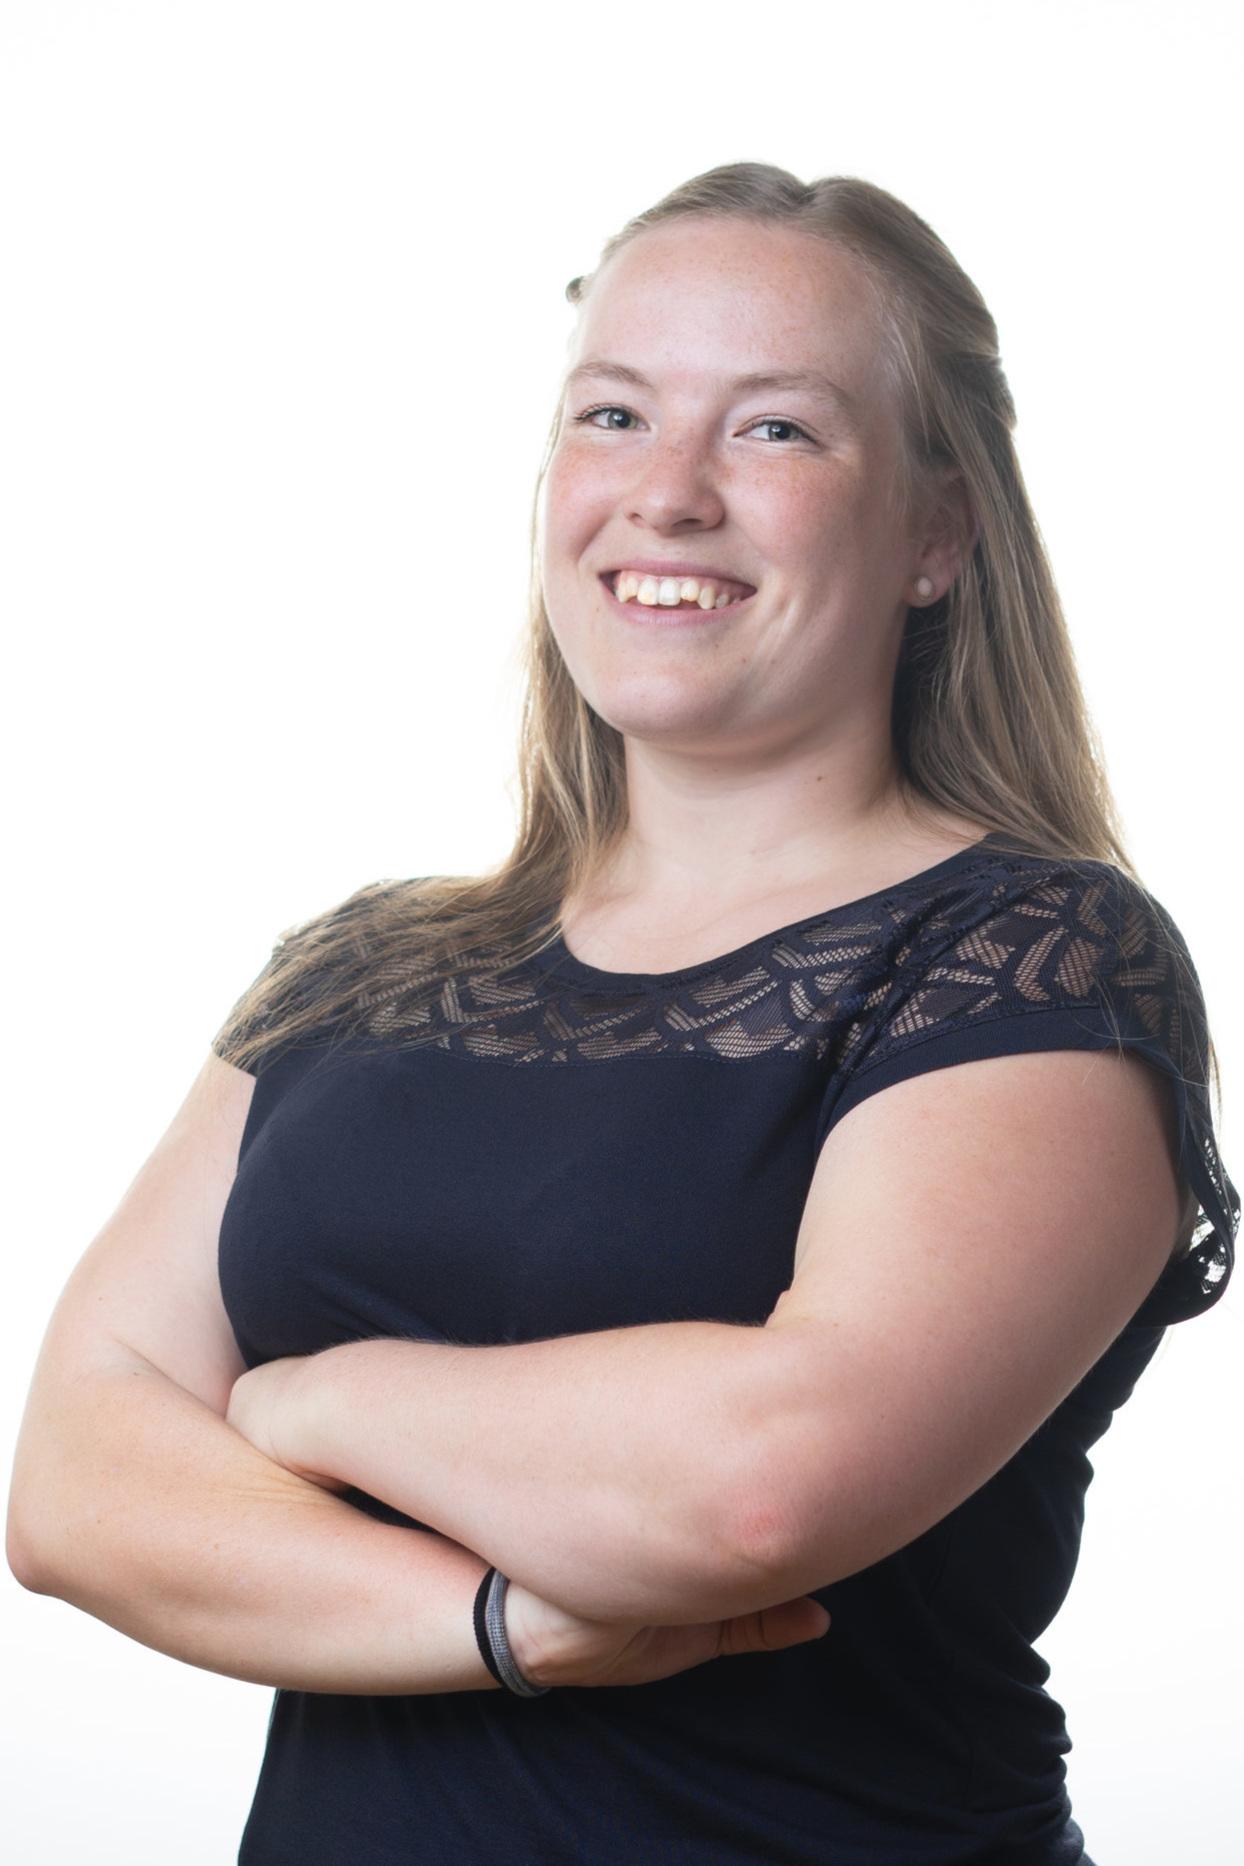 Laura FAIß     6. Semester Humanmedizin  2. stv. Vorsitzende der Studienvertretung Humanmedizin